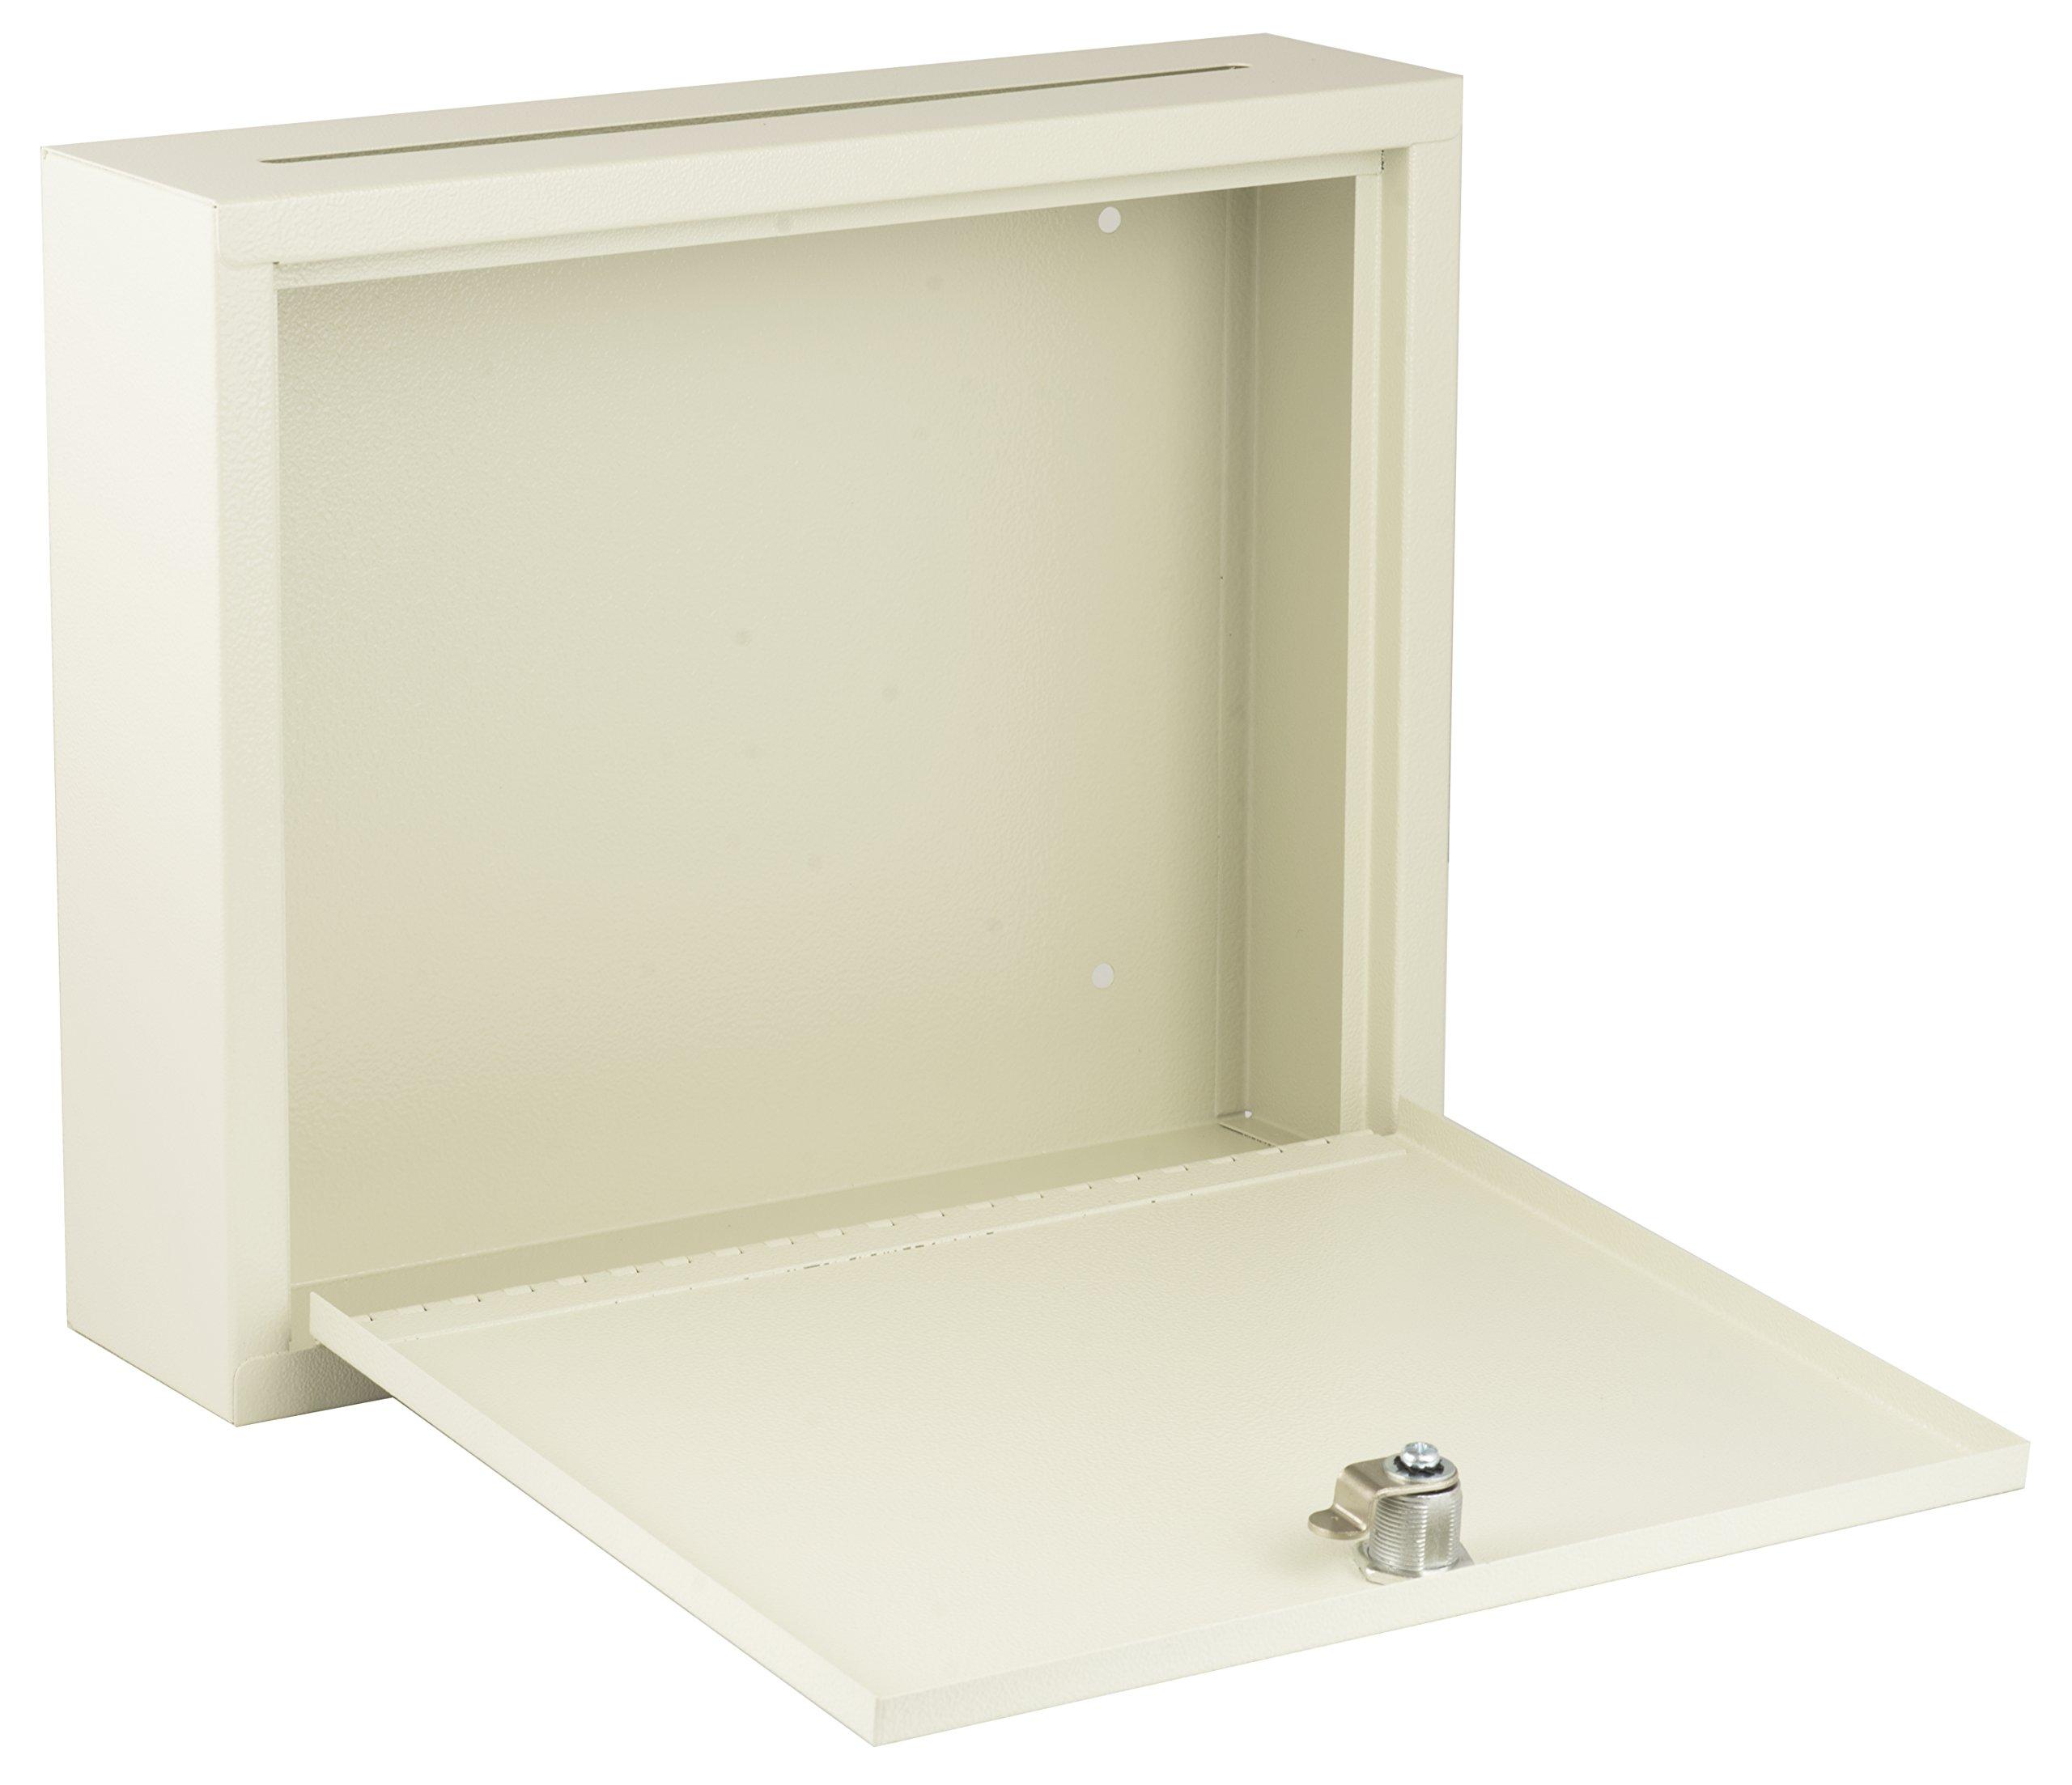 AdirOffice Multi Purpose, Mail Box, Drop Box, Suggestion Box, Wall Mountable, 3'' x 10'' x 12'' - Sand Beige by Adir Corp. (Image #2)